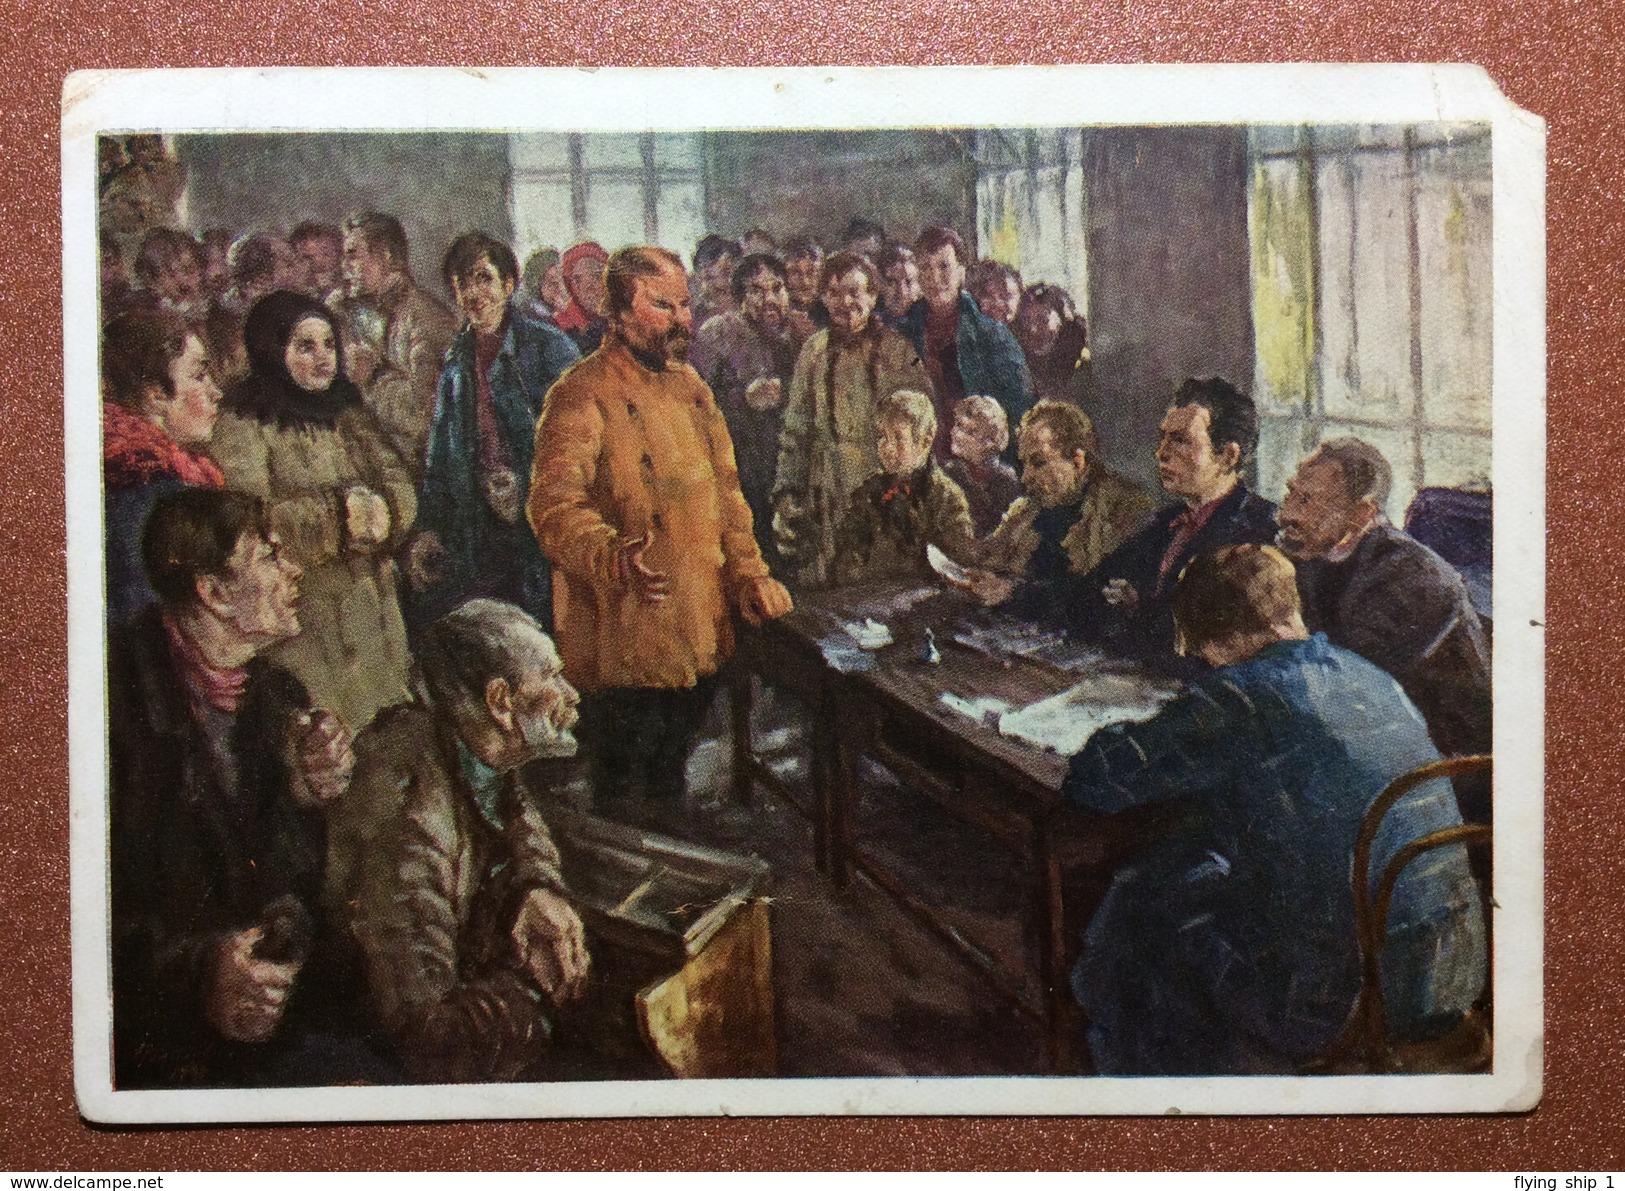 RARE Old Russian Postcard GOZNAK 1931 Russia Dekulakization Soviet Reform 1929 Fighting The Rich Artist Radimov - Russie